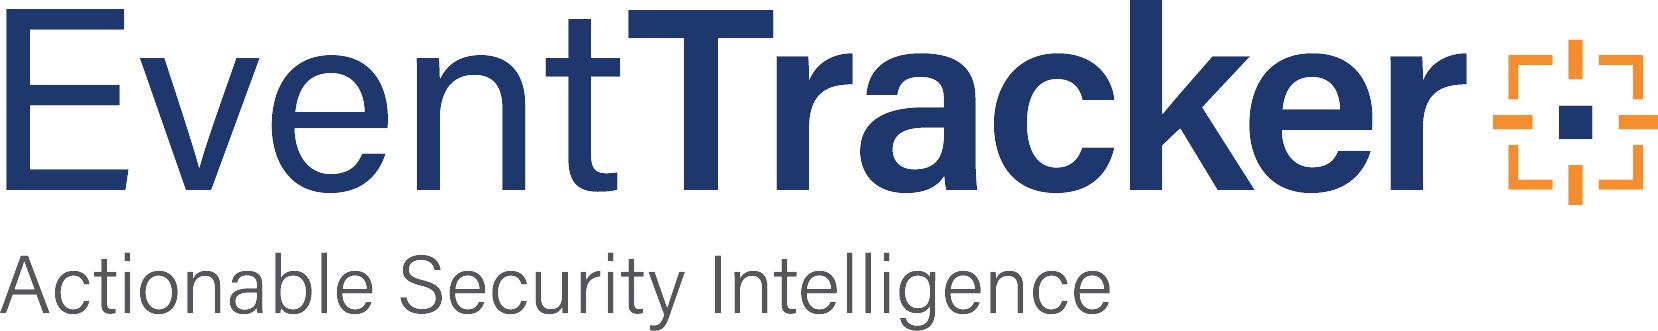 EventTracker's New Partner Program Transforms MSPs into MSSPs